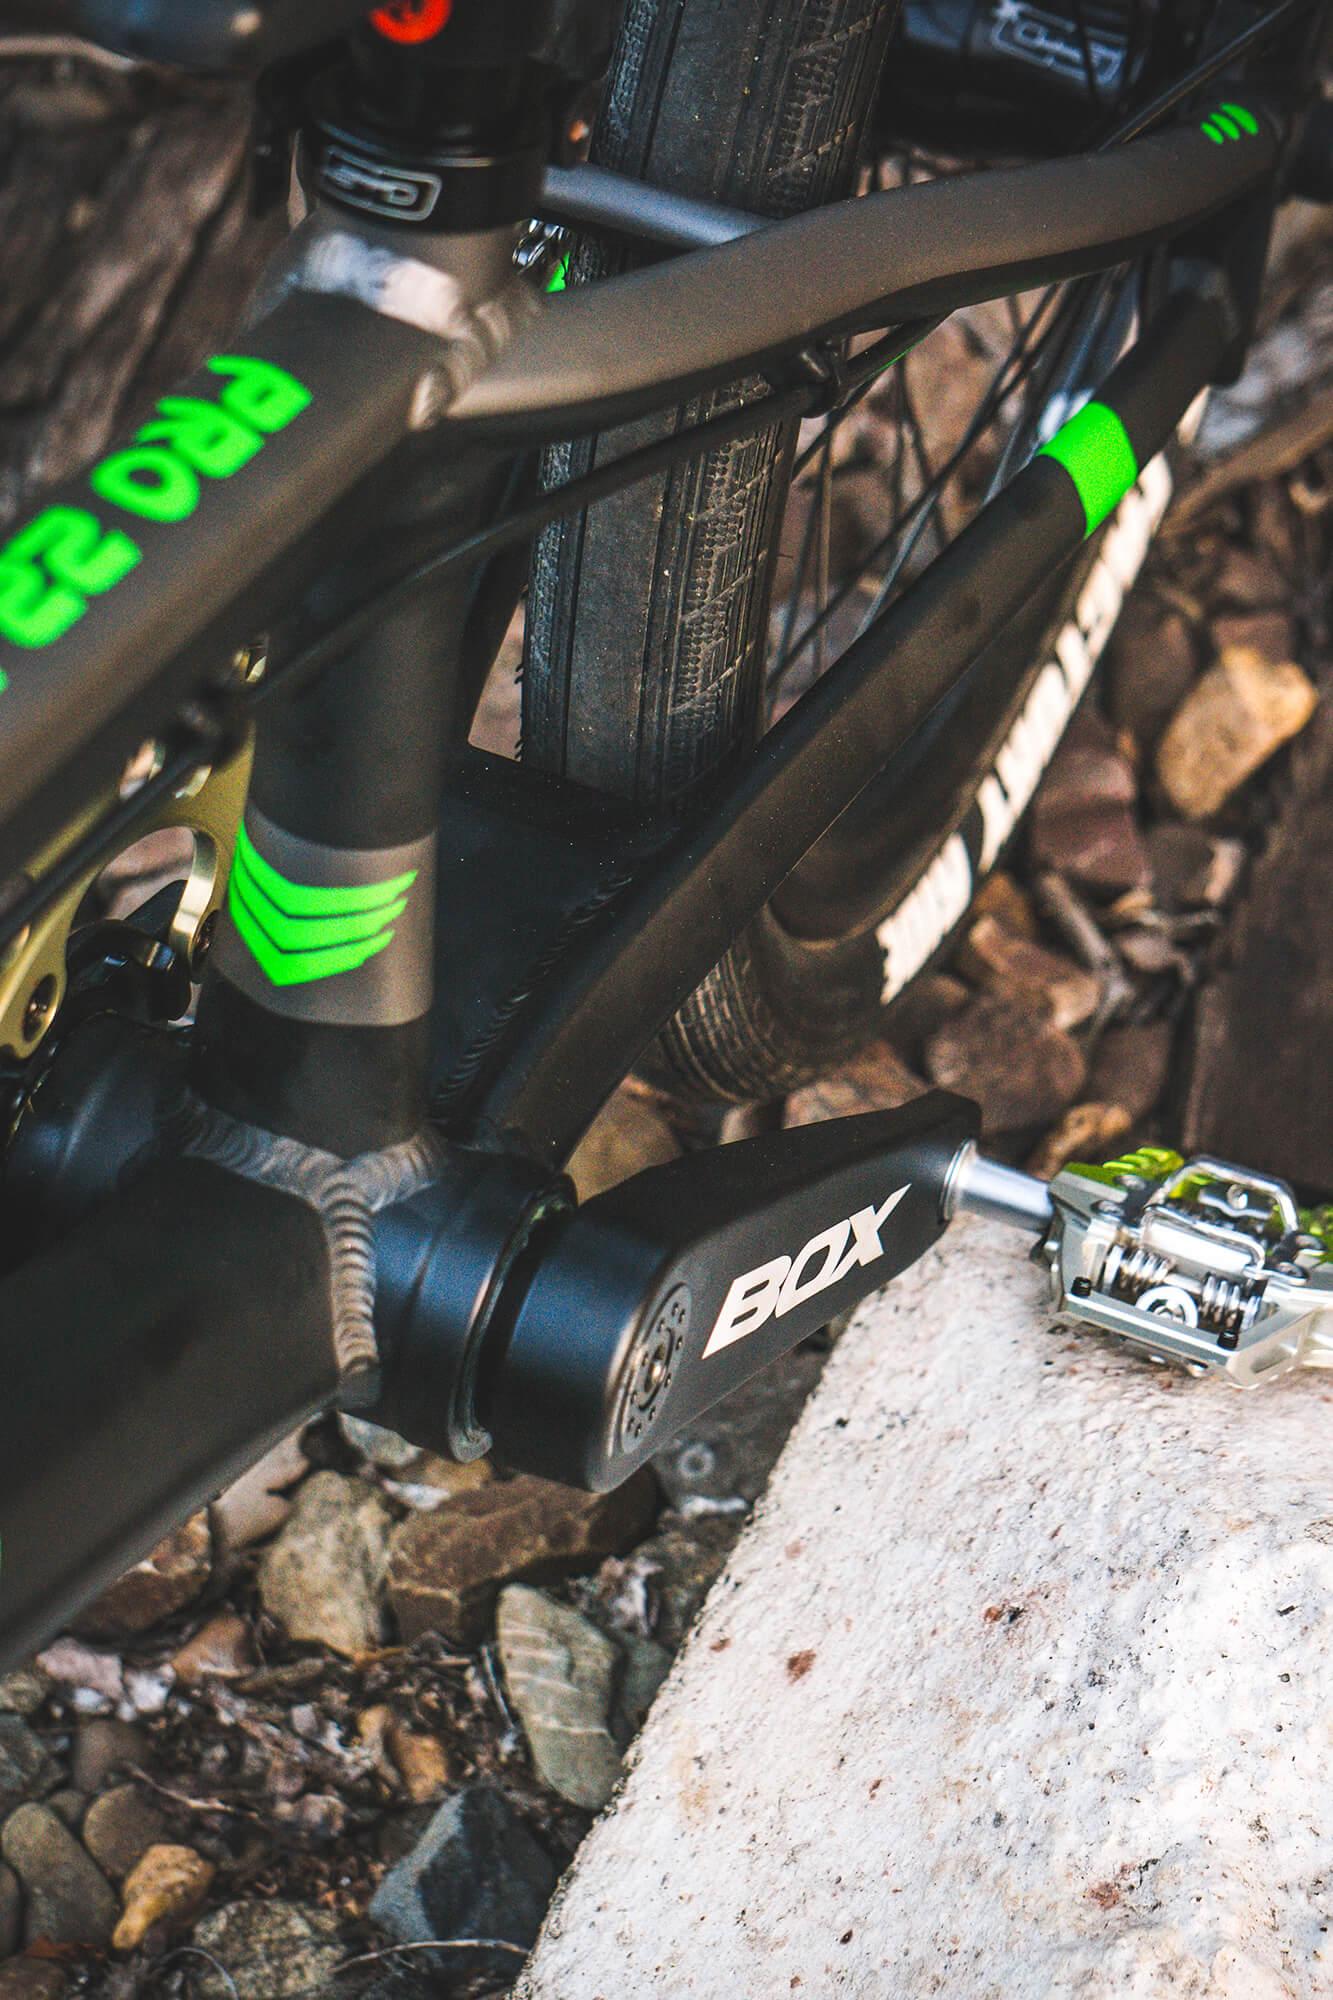 Team Oegema TVE Bike Check 2020 - DSC02295 - Niel Bensink